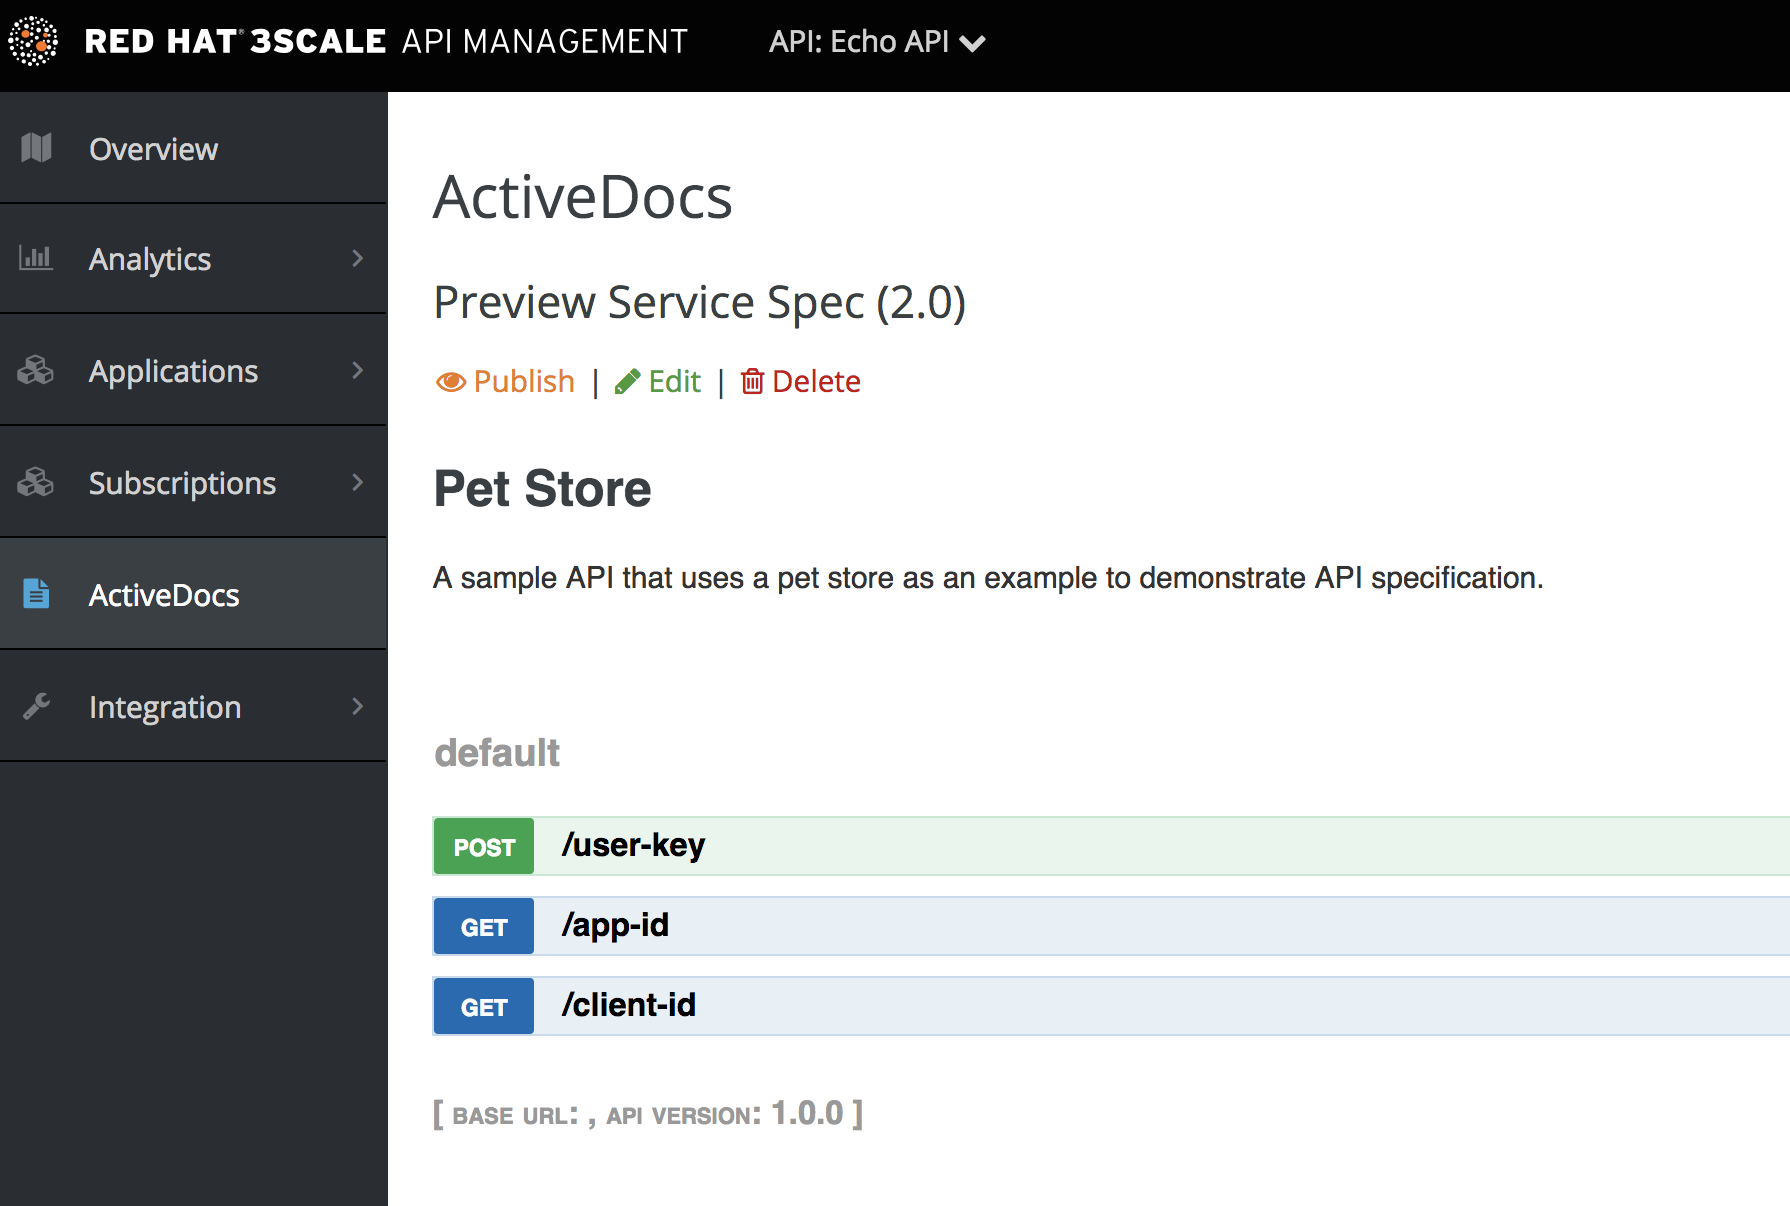 ActiveDocs New Spec View